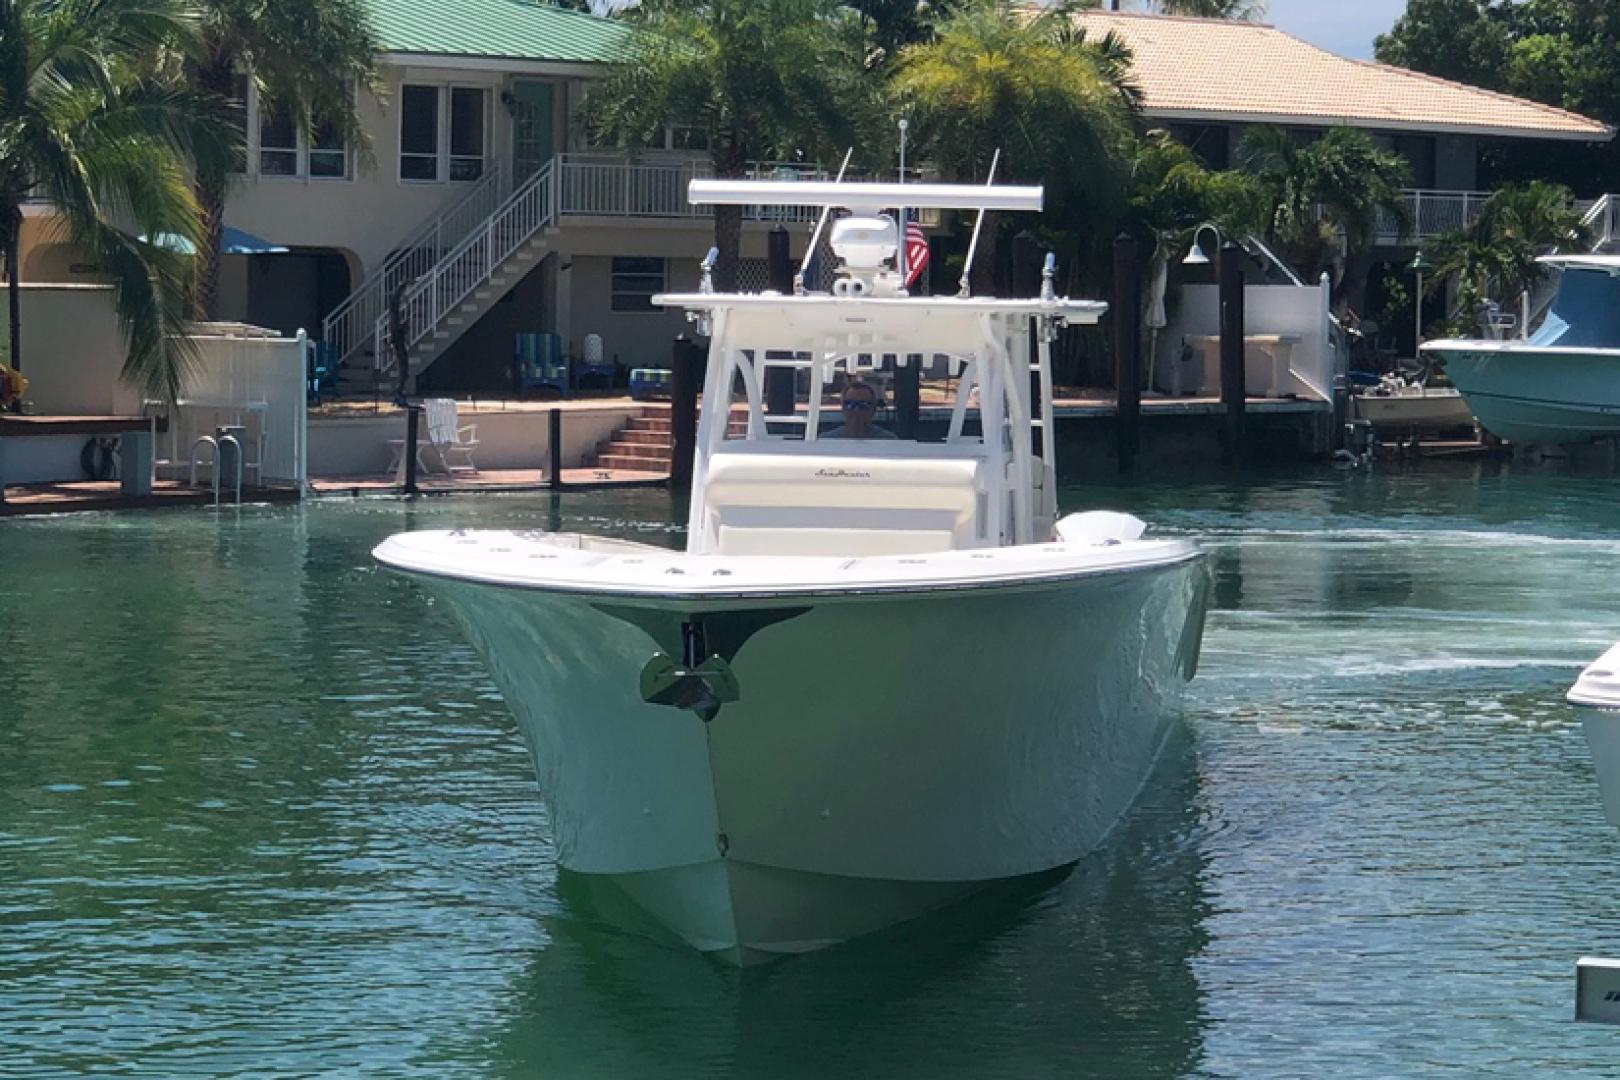 SeaHunter-45 Center Console 2016-No Name Bal Harbour-Florida-United States-2016 Sea Hunter 45 Center Console  Profile-1469677   Thumbnail